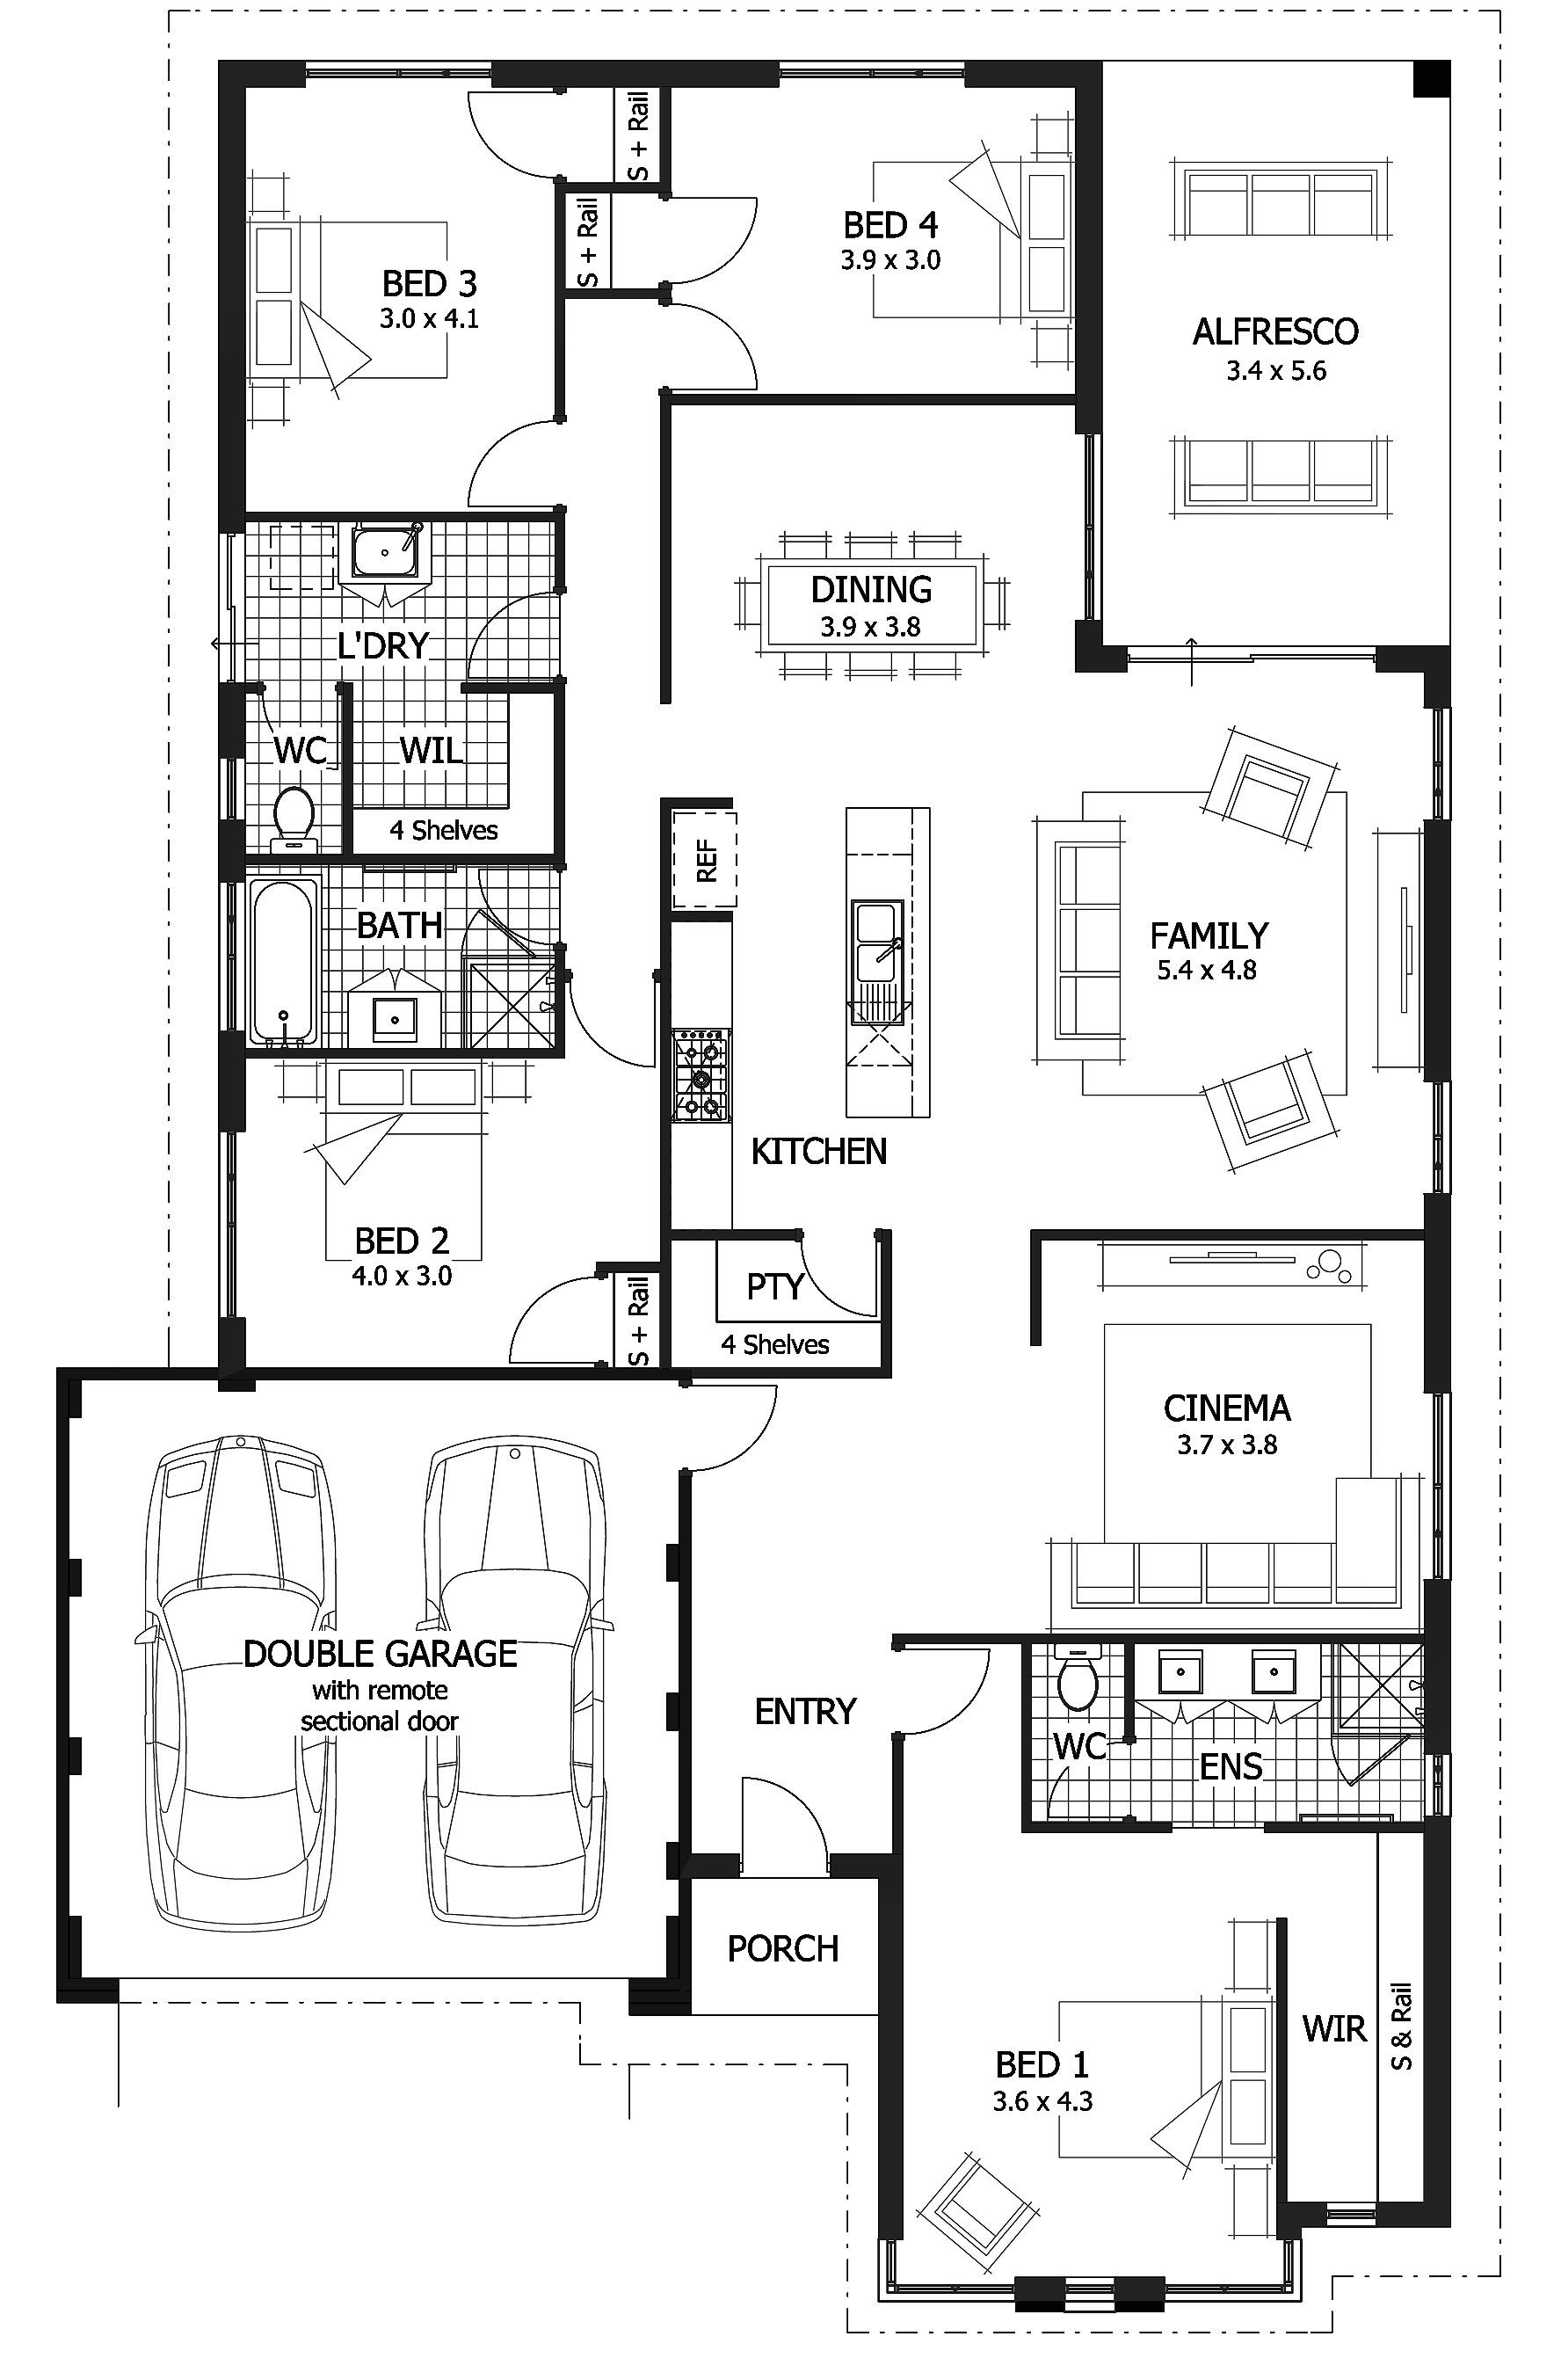 home designs plans under 200000